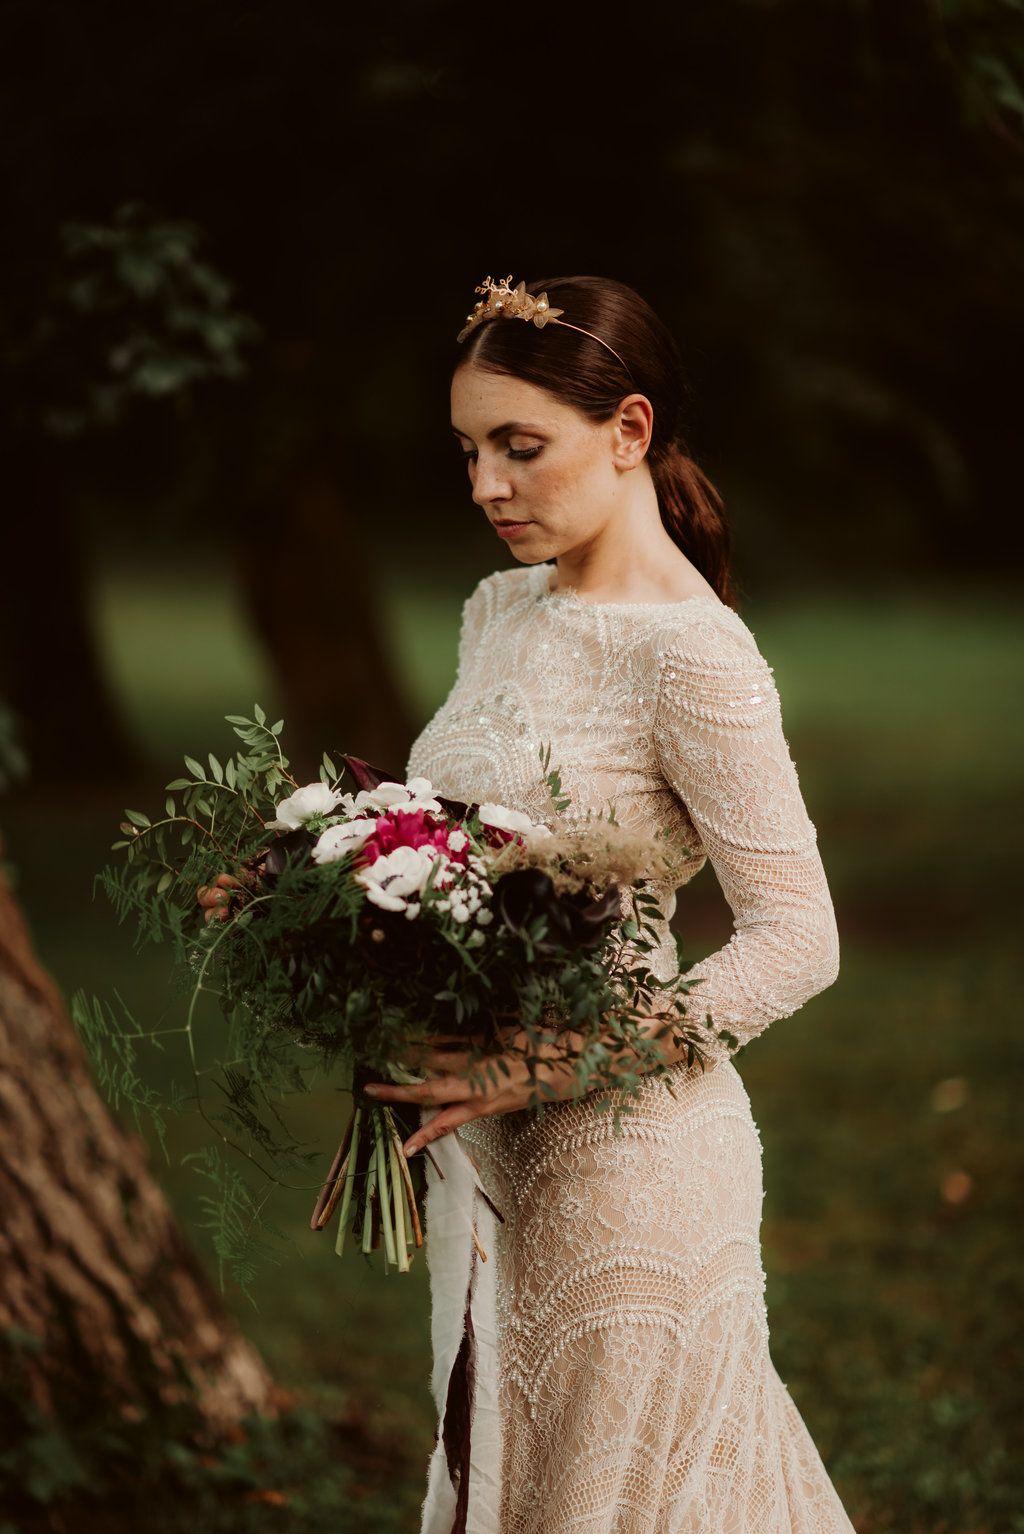 Dark and Moody Burgundy and Greenery Wedding in Austria